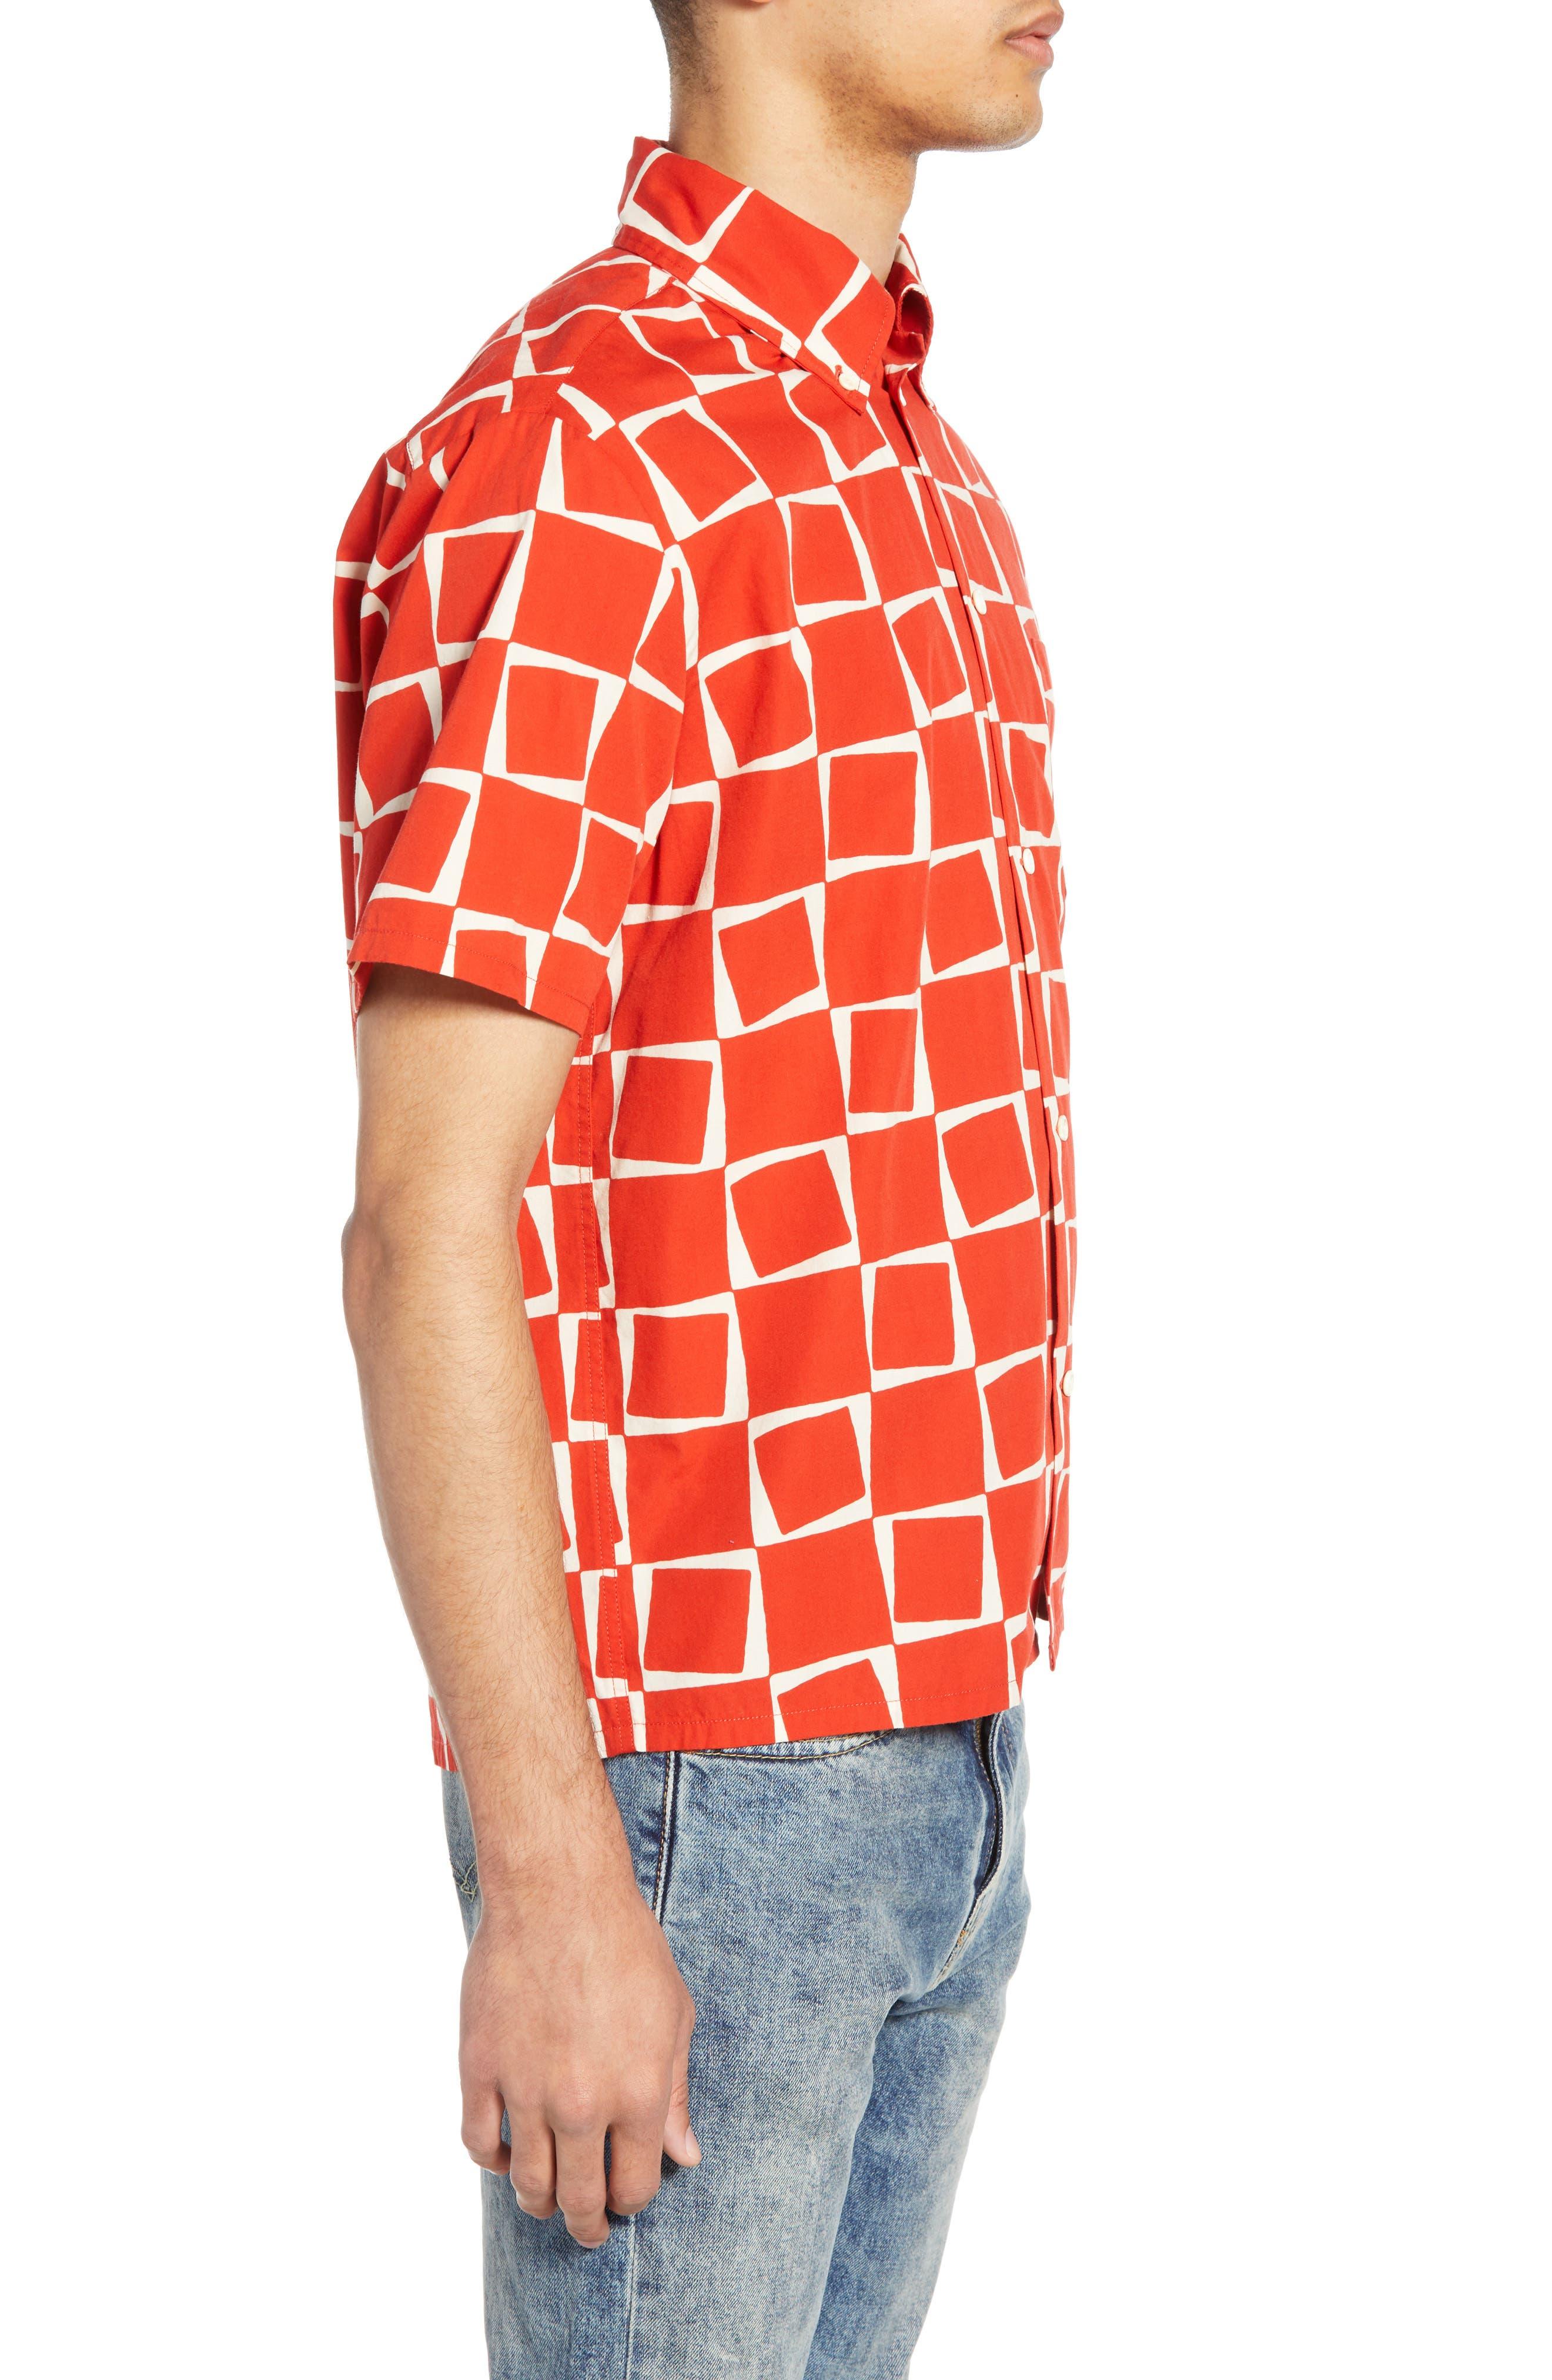 LEVI'S<SUP>®</SUP> VINTAGE CLOTHING, 1950s Regular Atomic Square Woven Shirt, Alternate thumbnail 4, color, 600